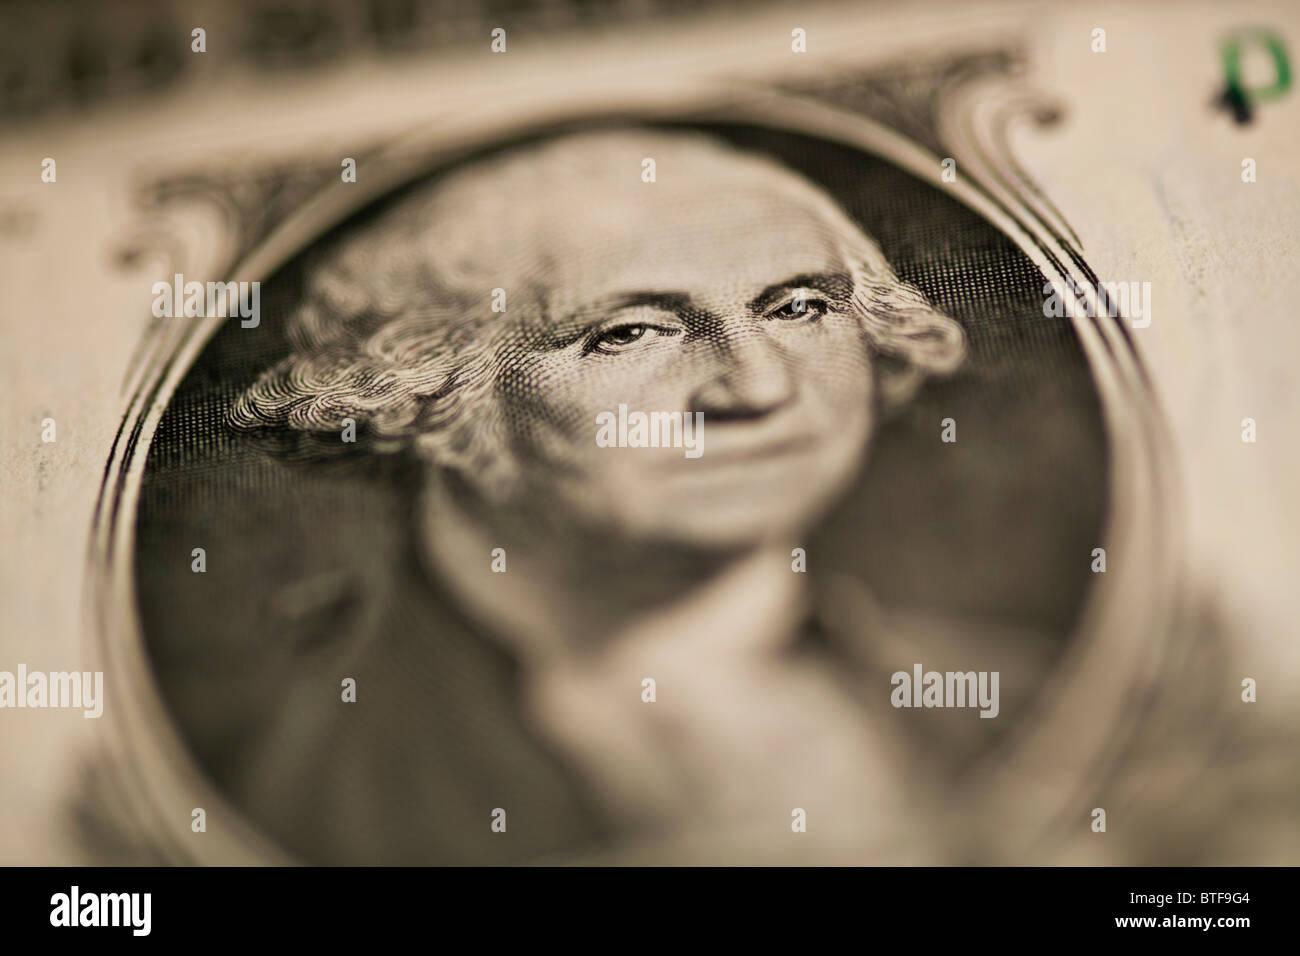 Close up of George Washington on one dollar bill - Stock Image